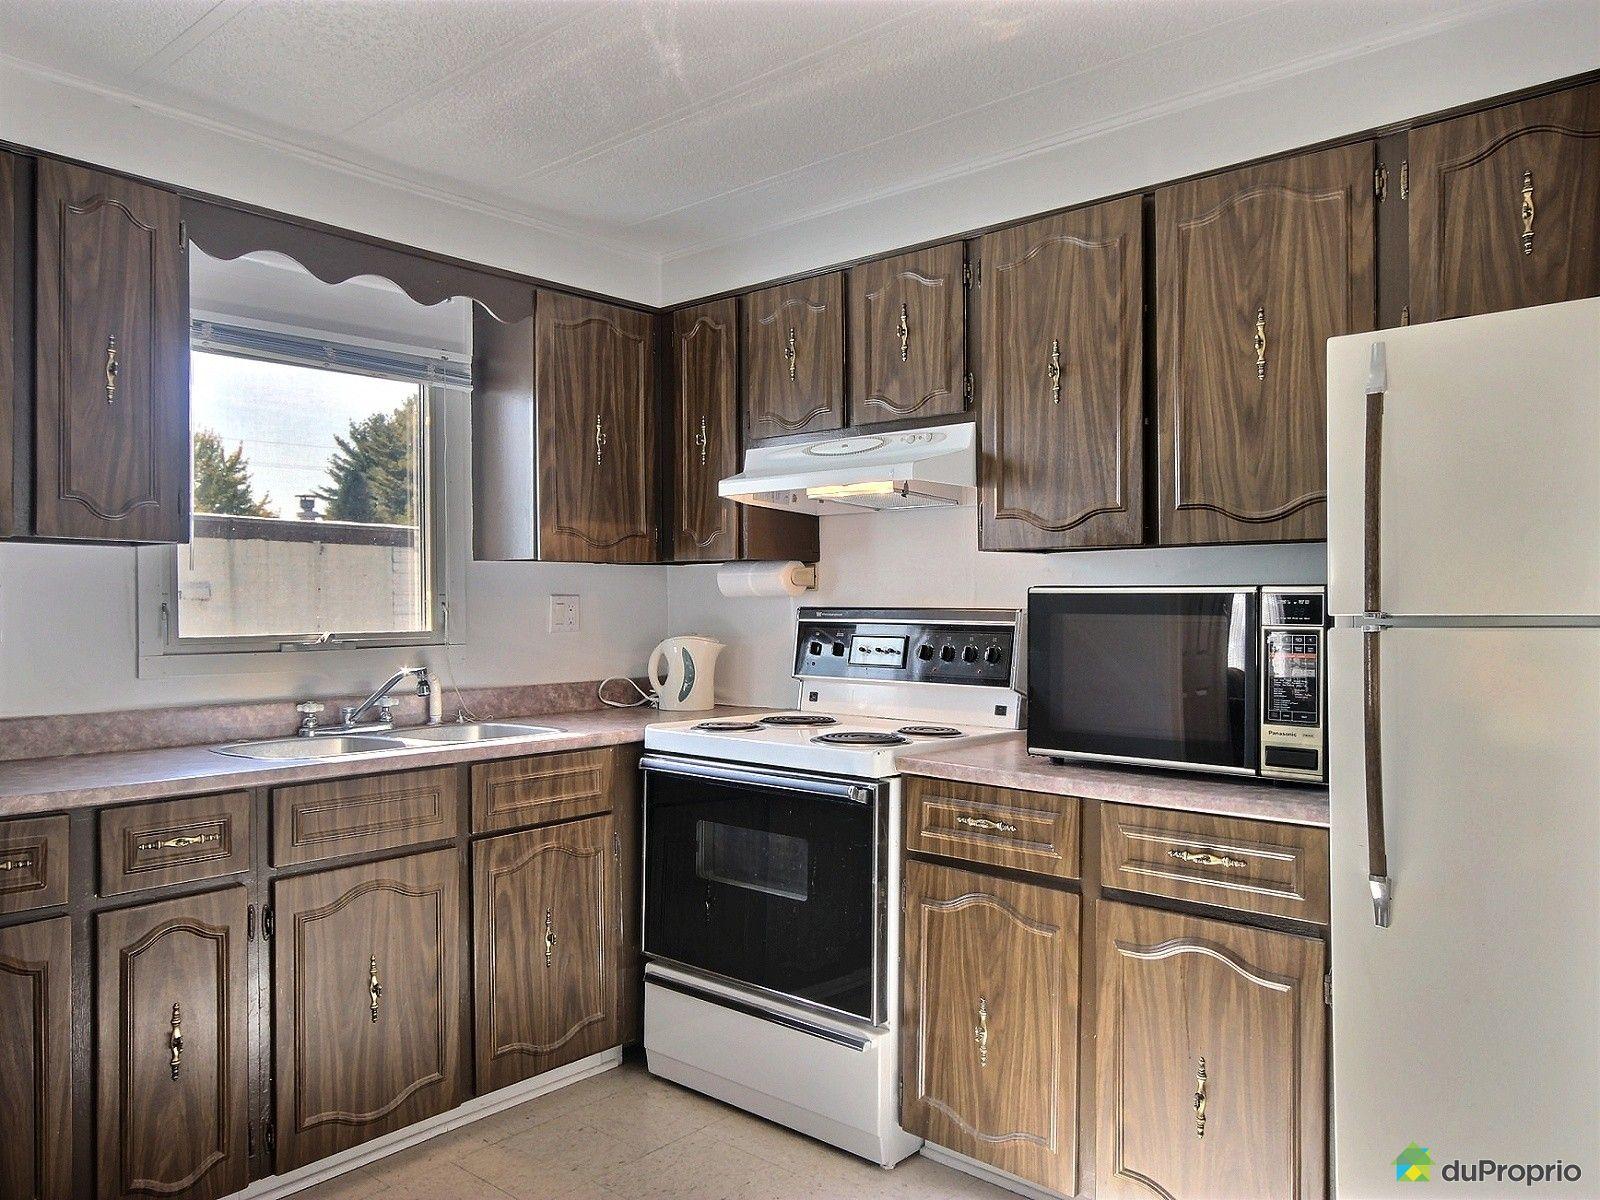 maison vendu drummondville immobilier qu bec duproprio 550151. Black Bedroom Furniture Sets. Home Design Ideas